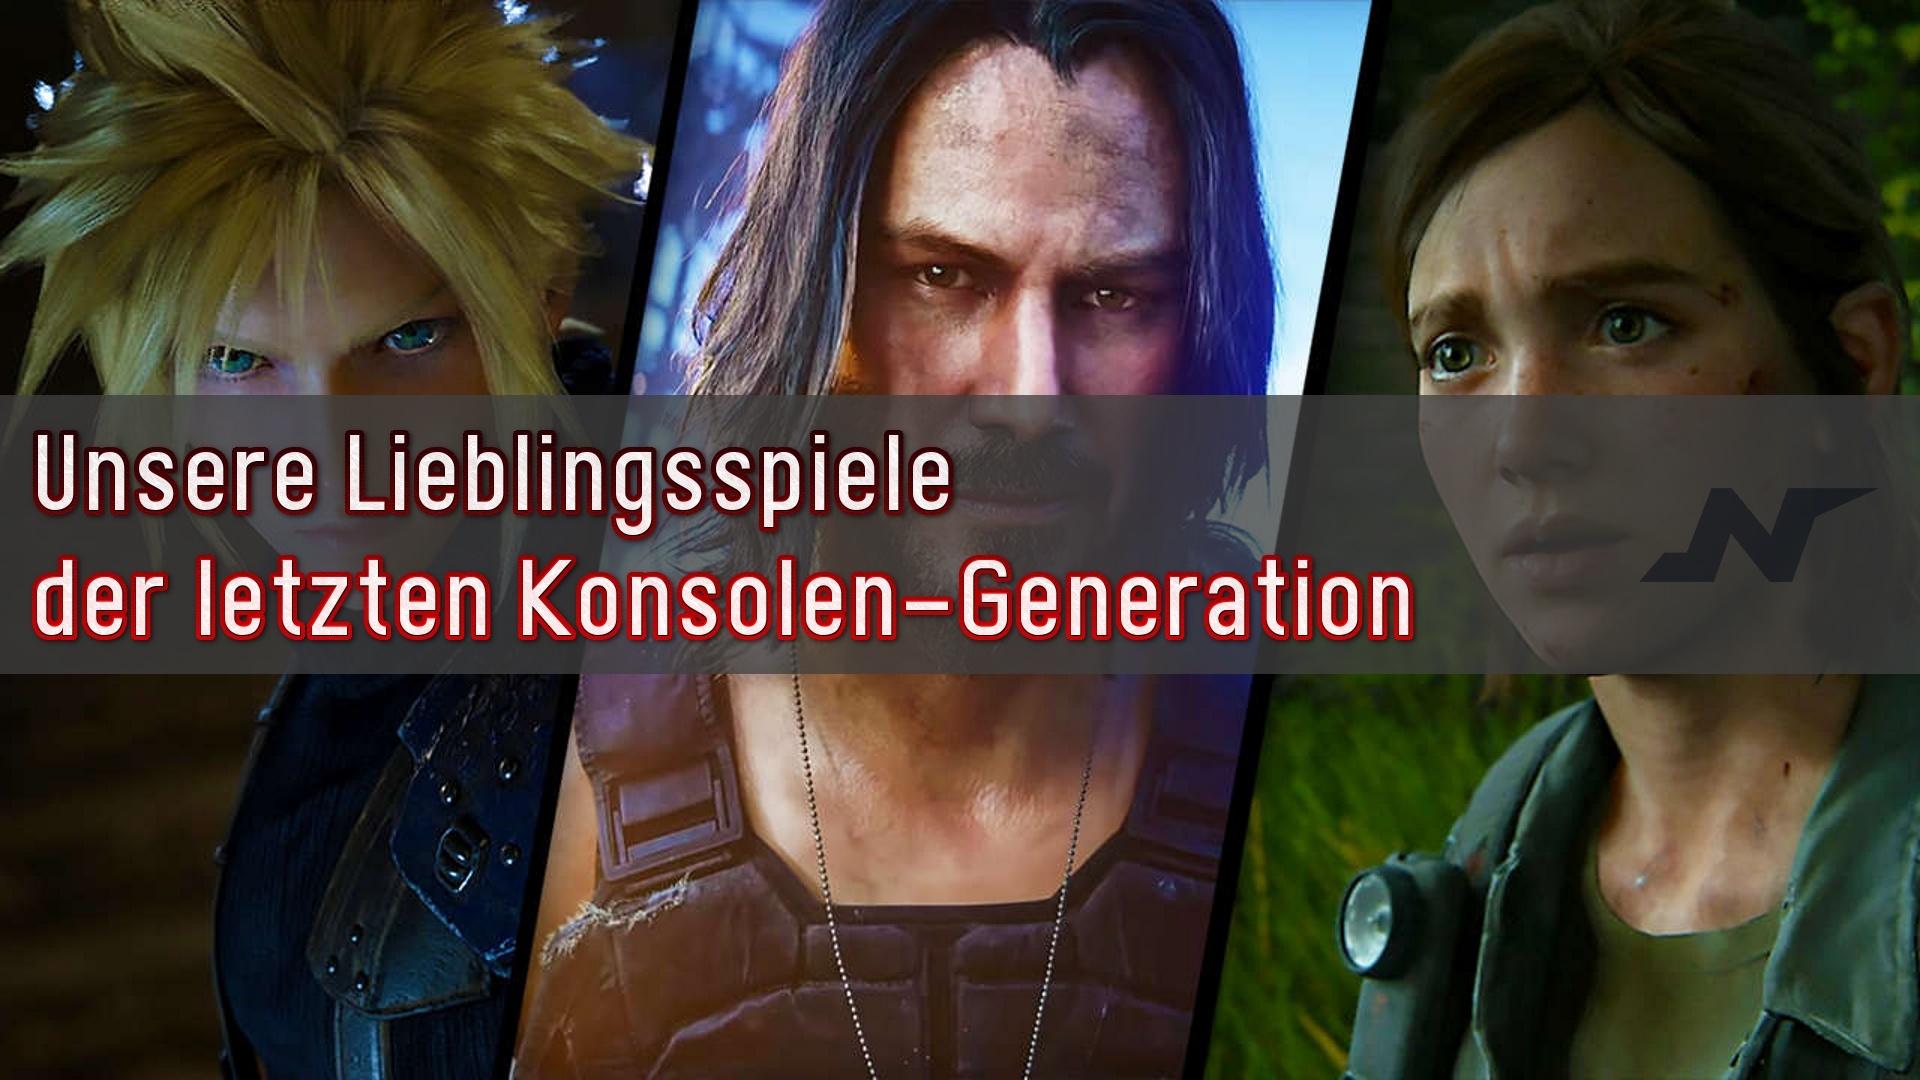 Lieblingsspiele der letzten Konsolen-Generation